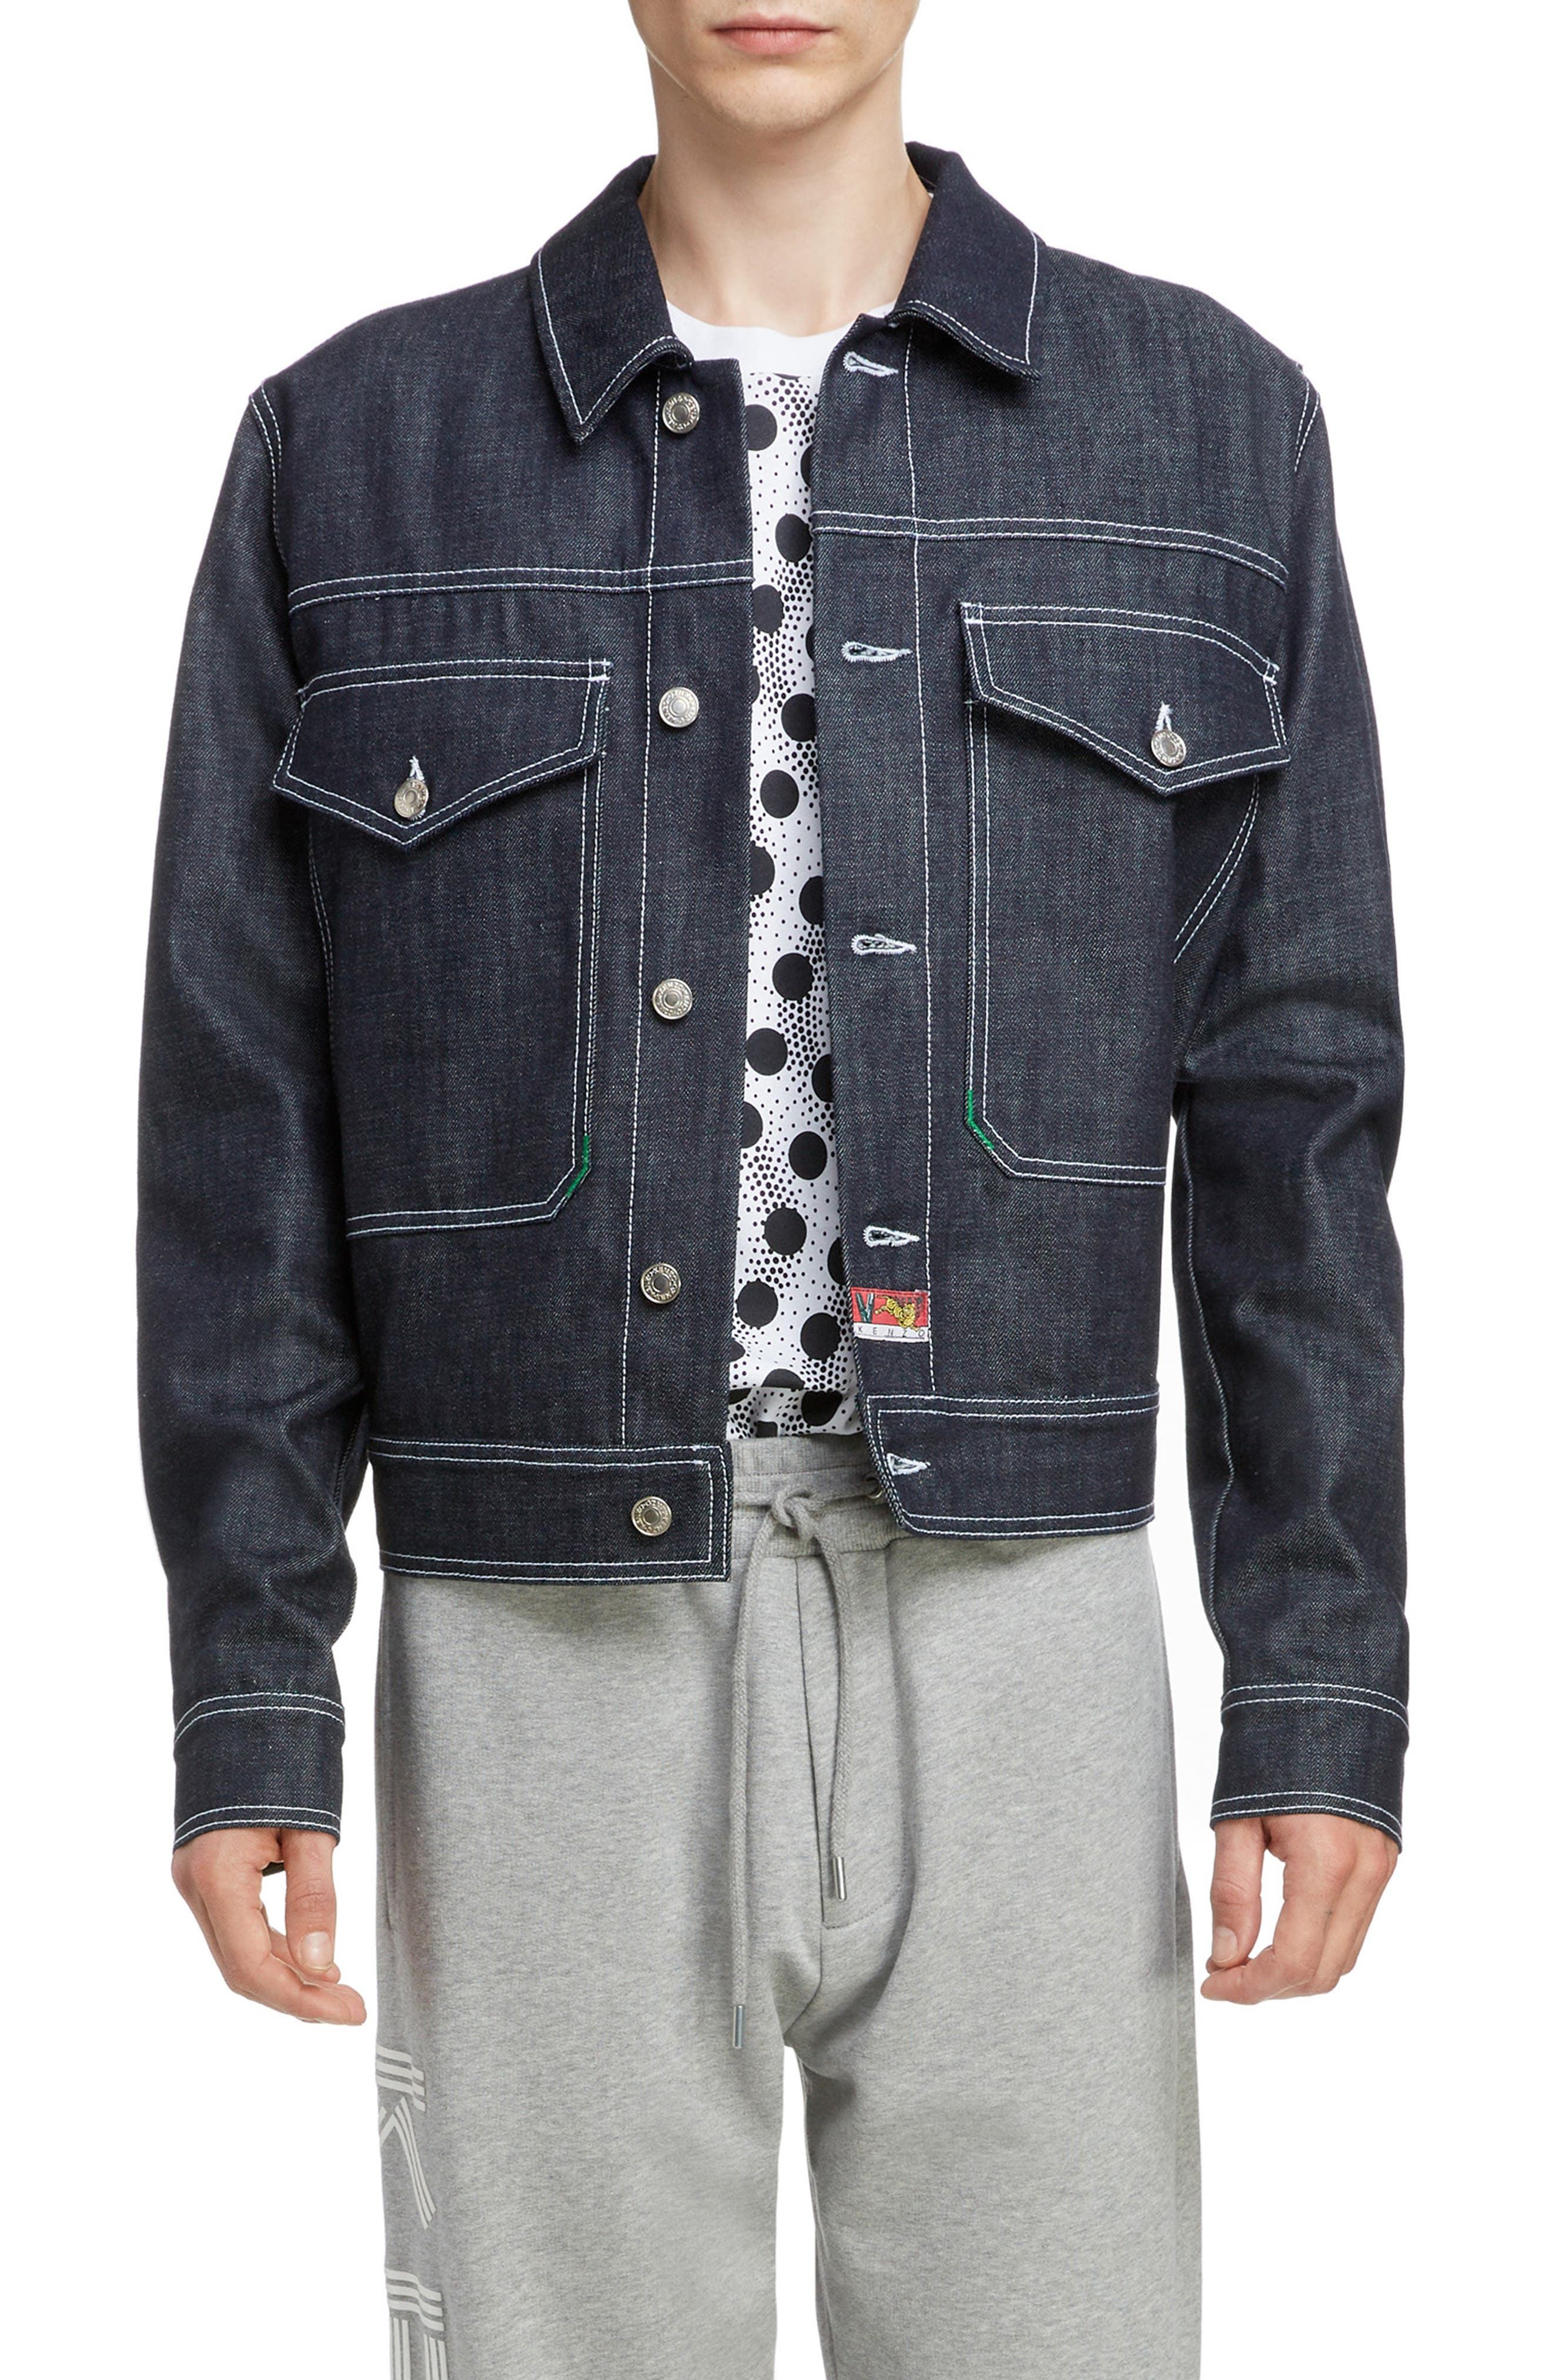 KENZO Jumping Tiger Embroidered Denim Jacket, Main, color, NAVY BLUE